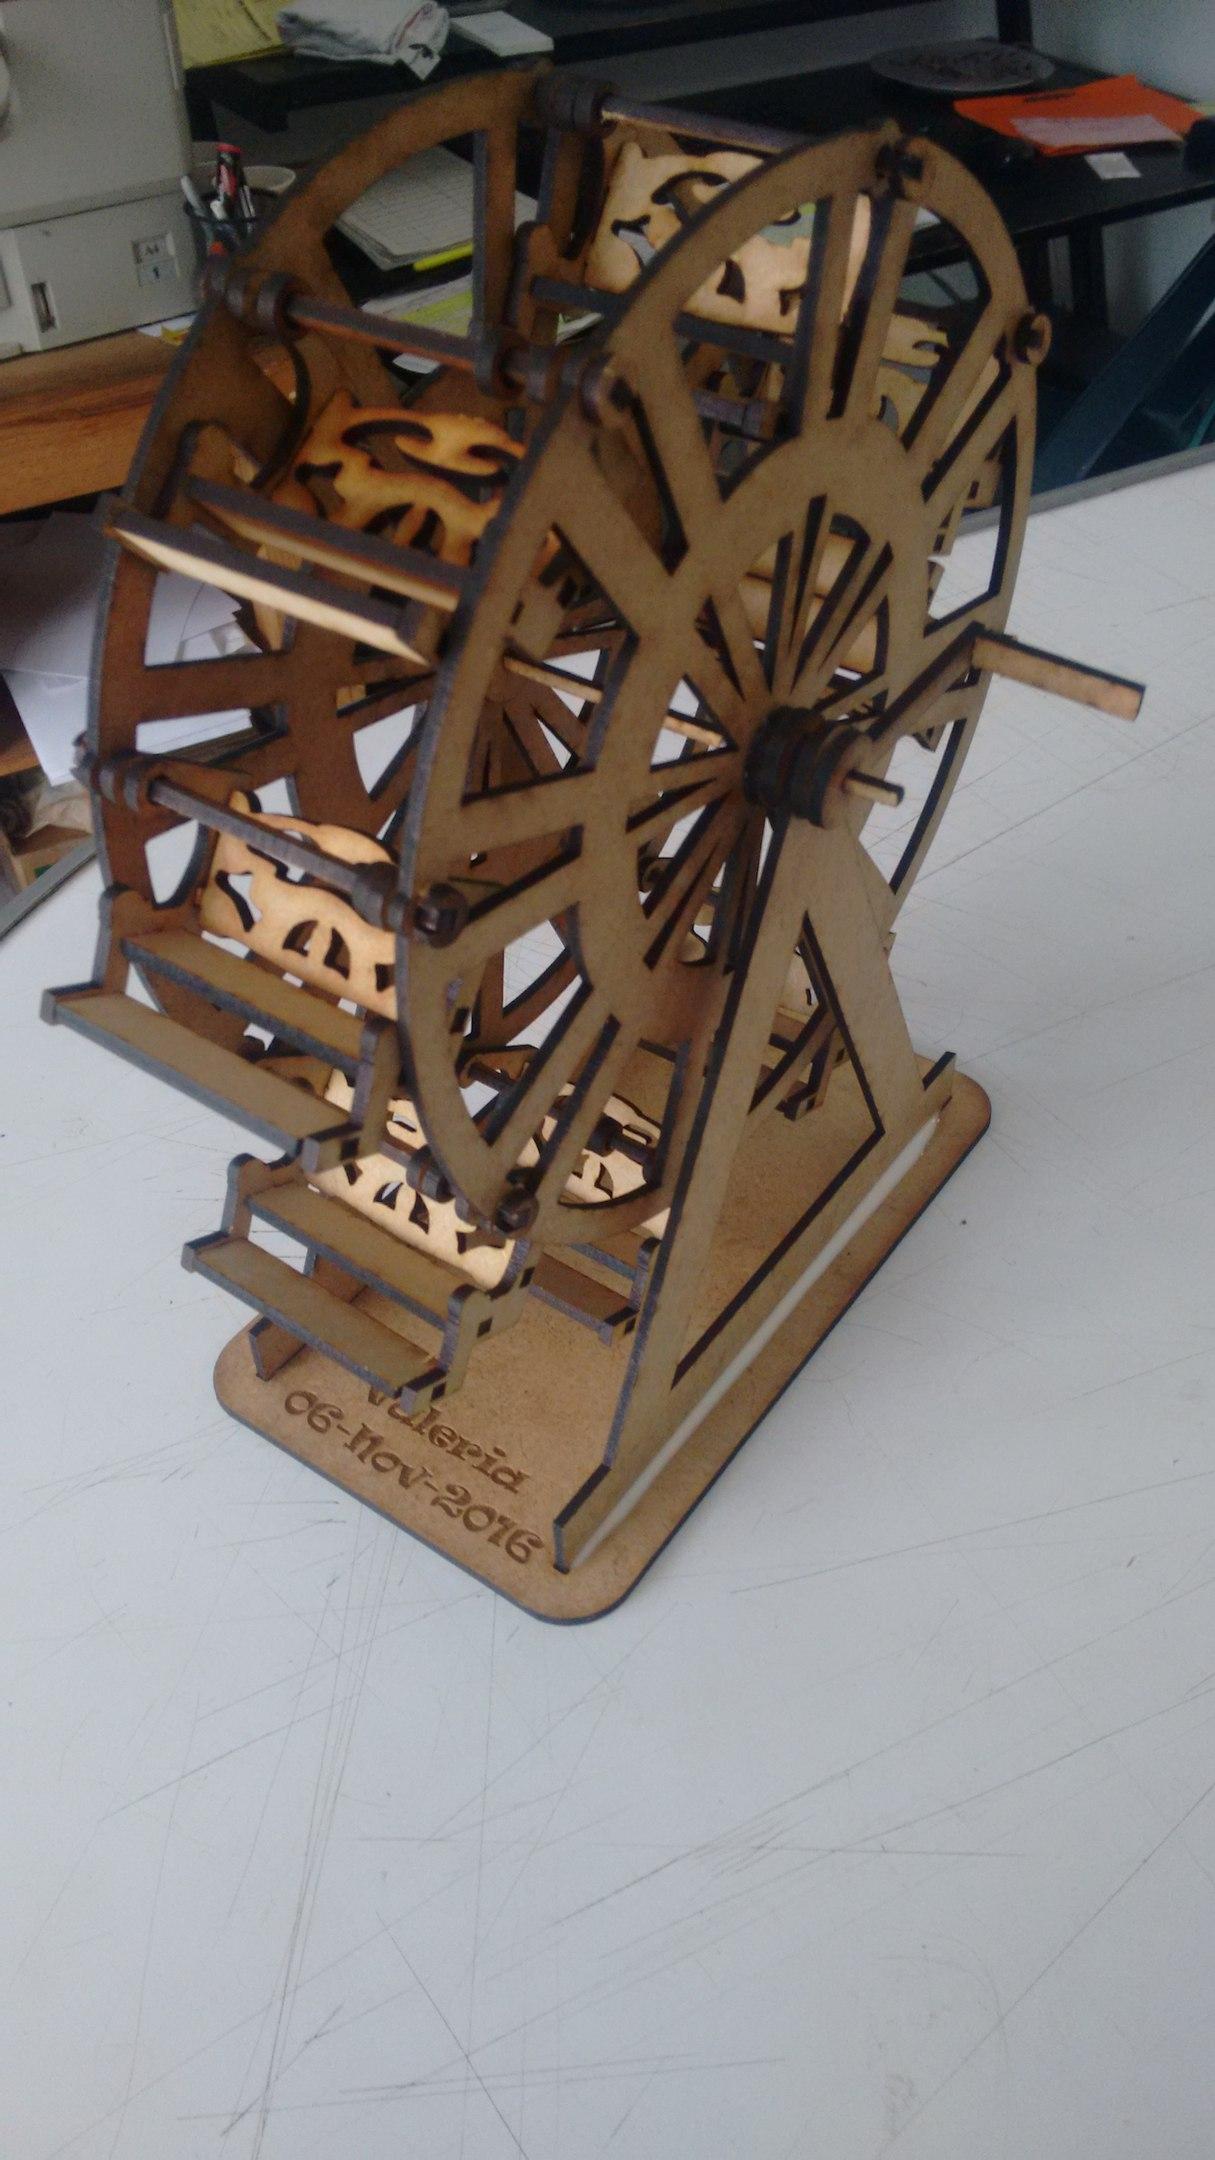 Ferris wheel 3D Puzzle Free Vector